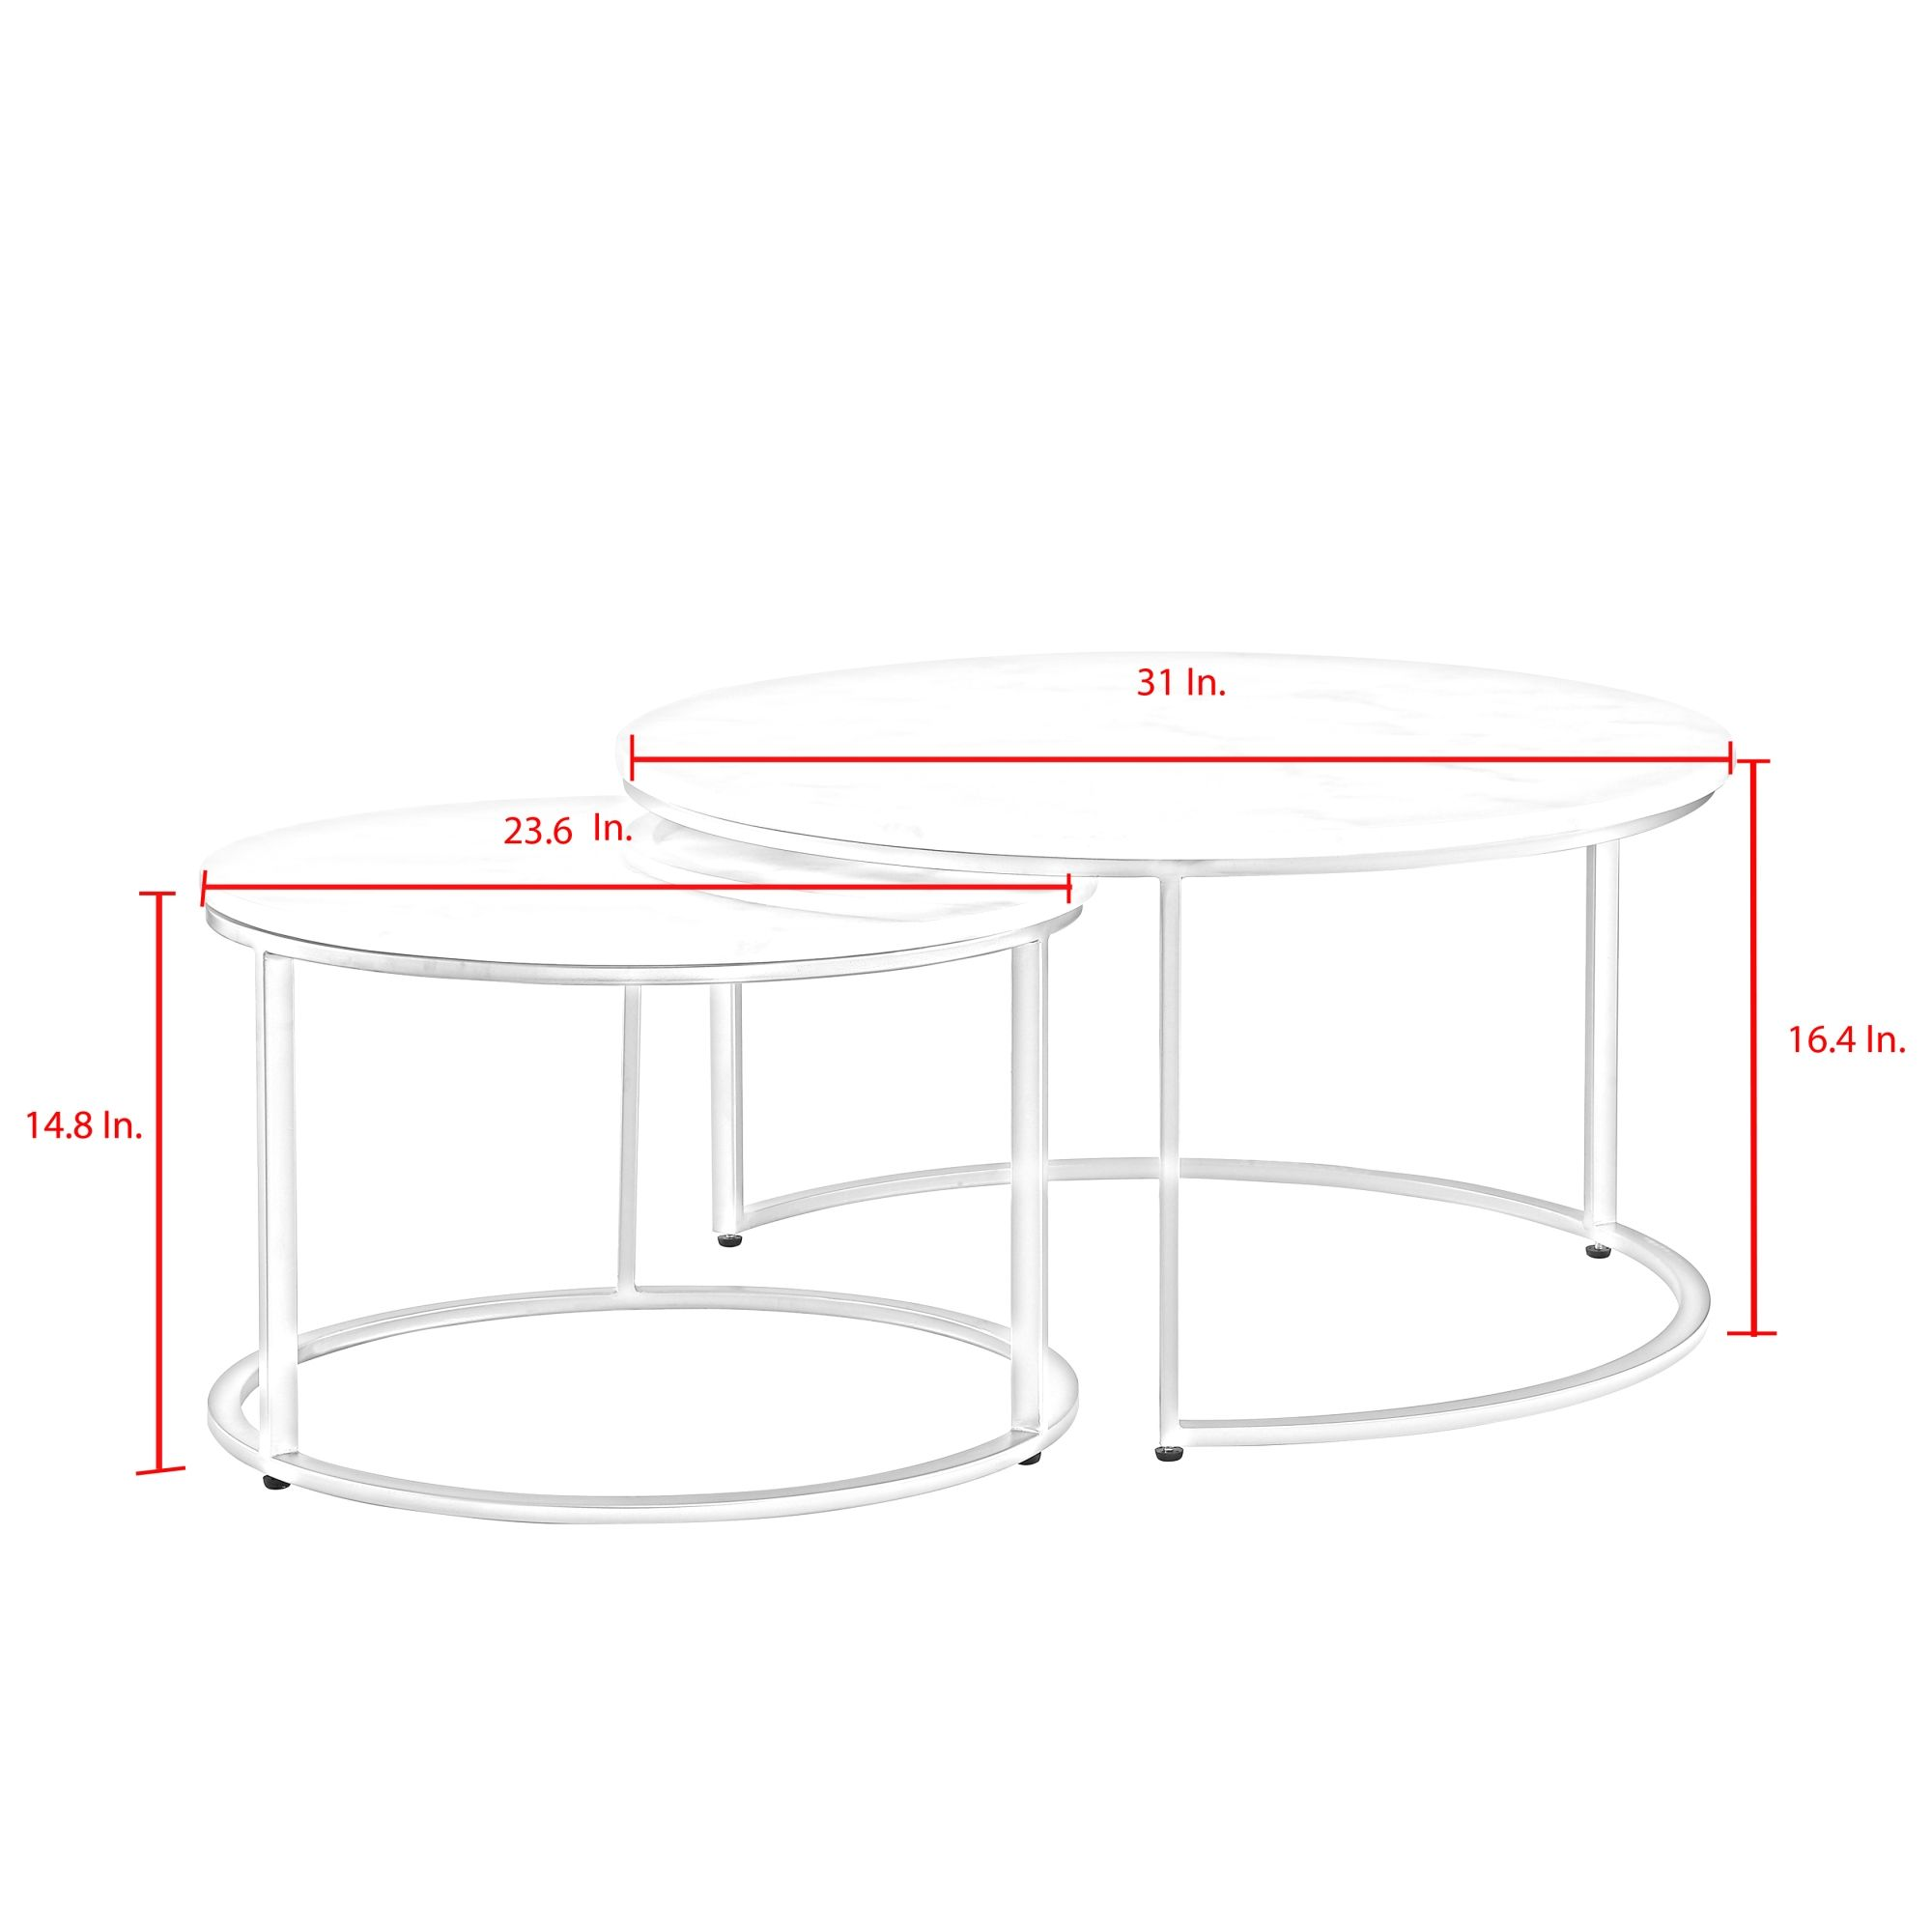 Irene Round Top Nesting Coffee Table In 2021 Coffee Table Nesting Coffee Tables Coffee Table Metal Frame [ 2000 x 2000 Pixel ]